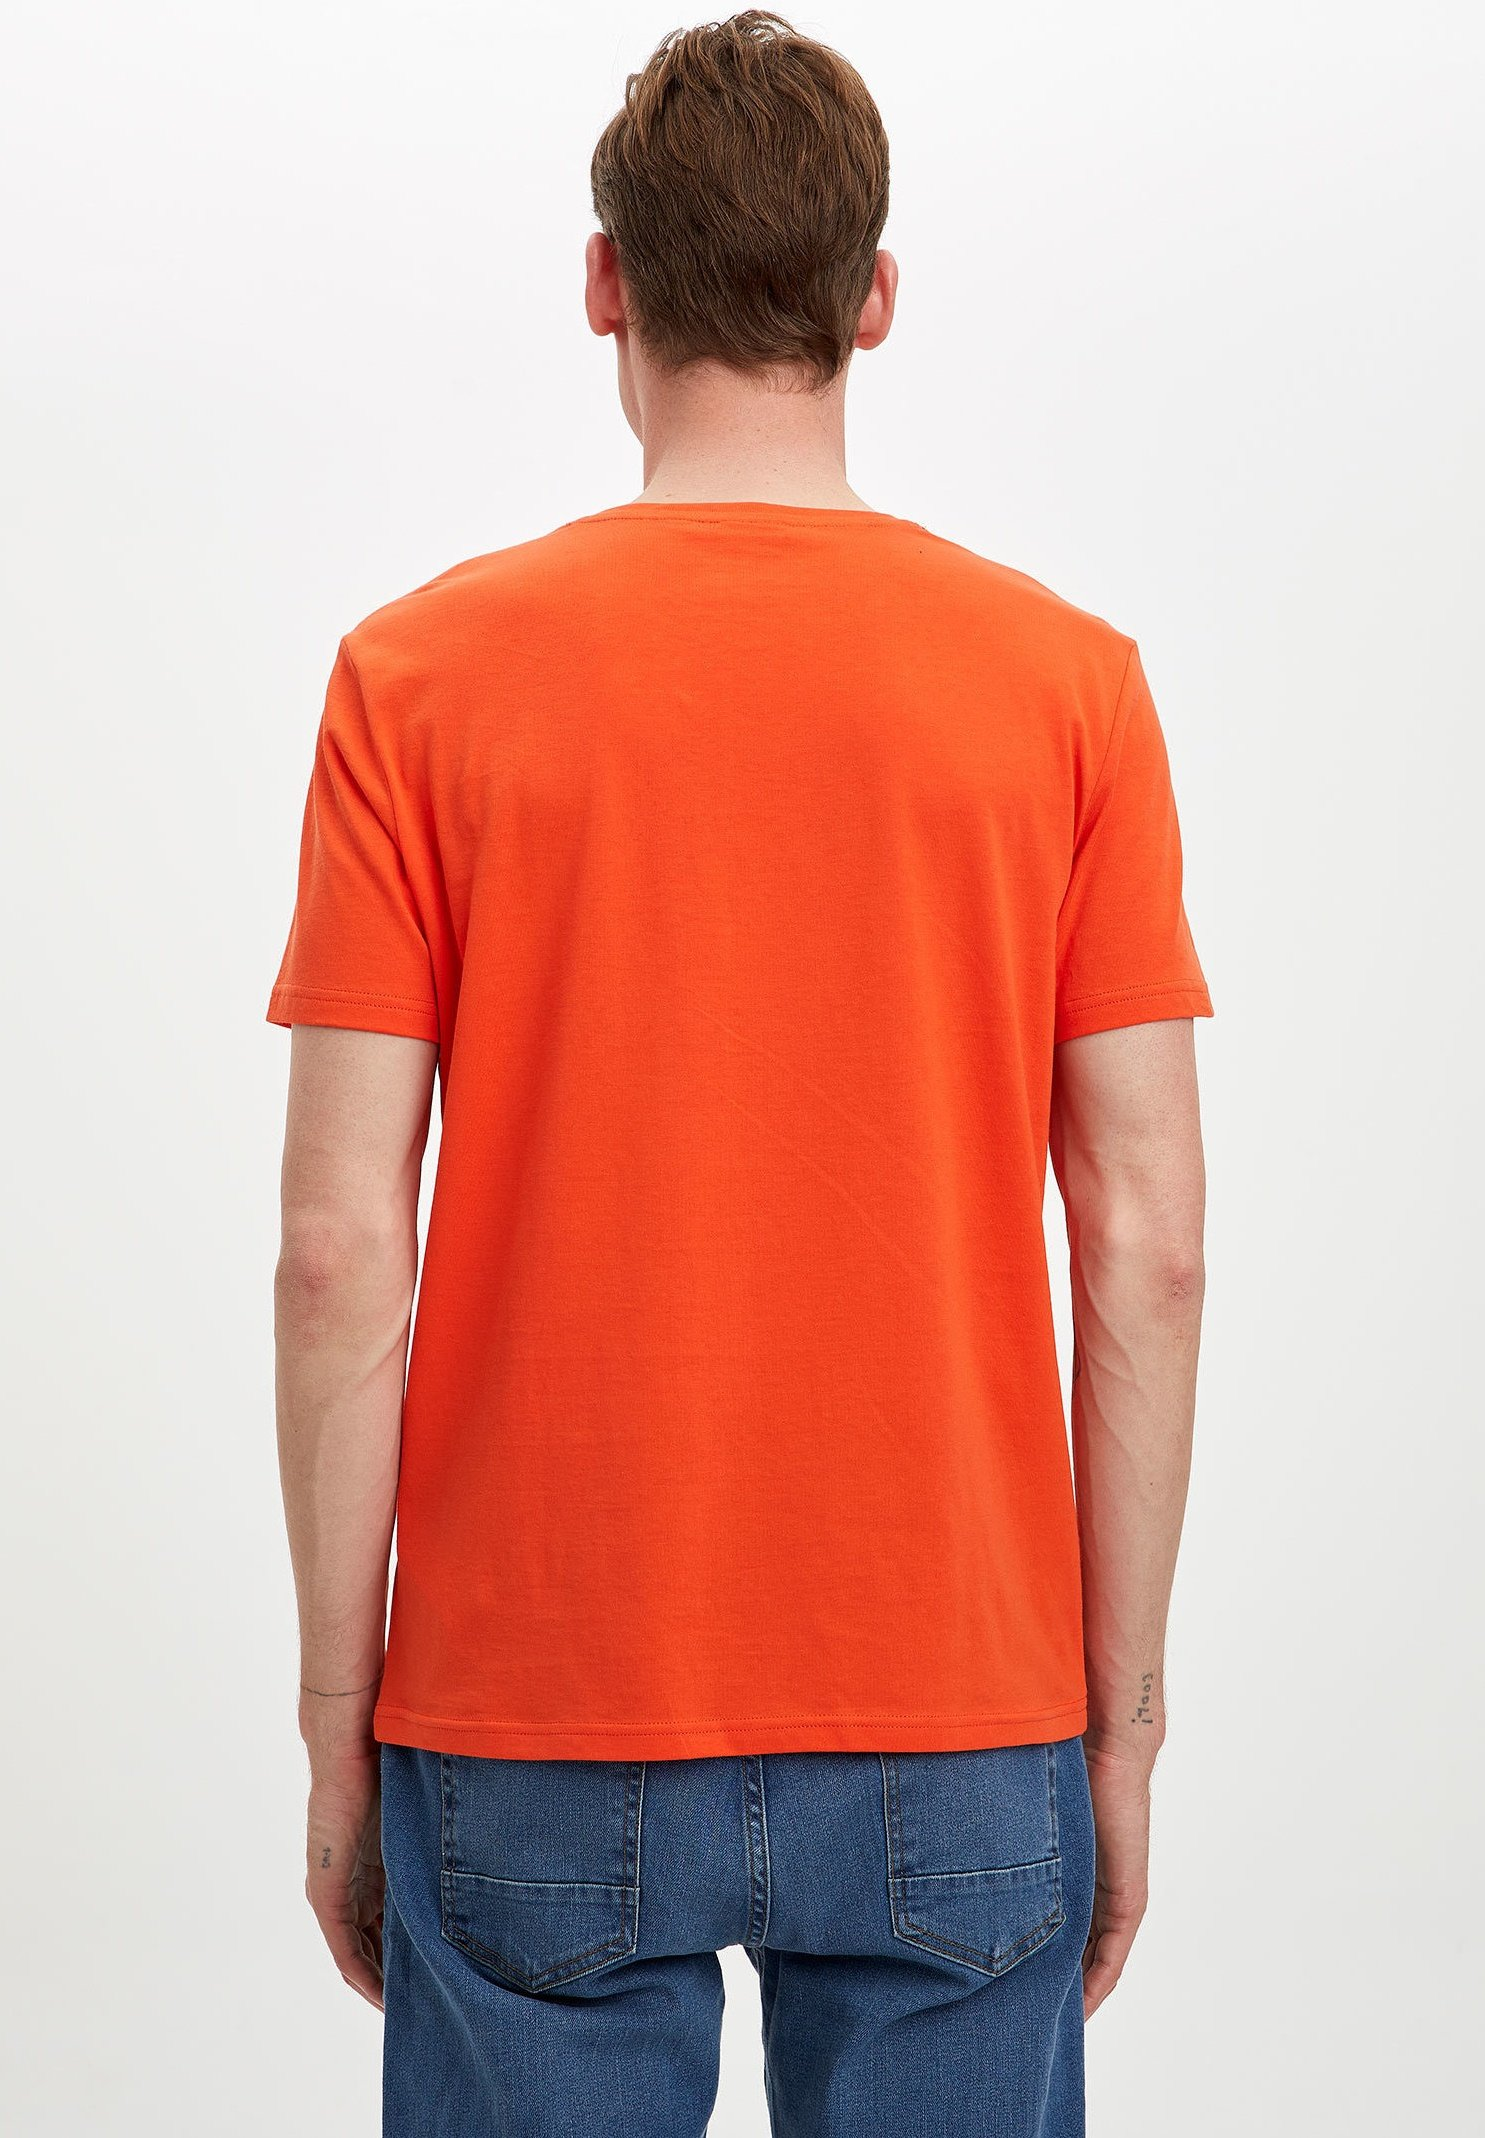 DeFacto Print T-shirt - orange TZsEG